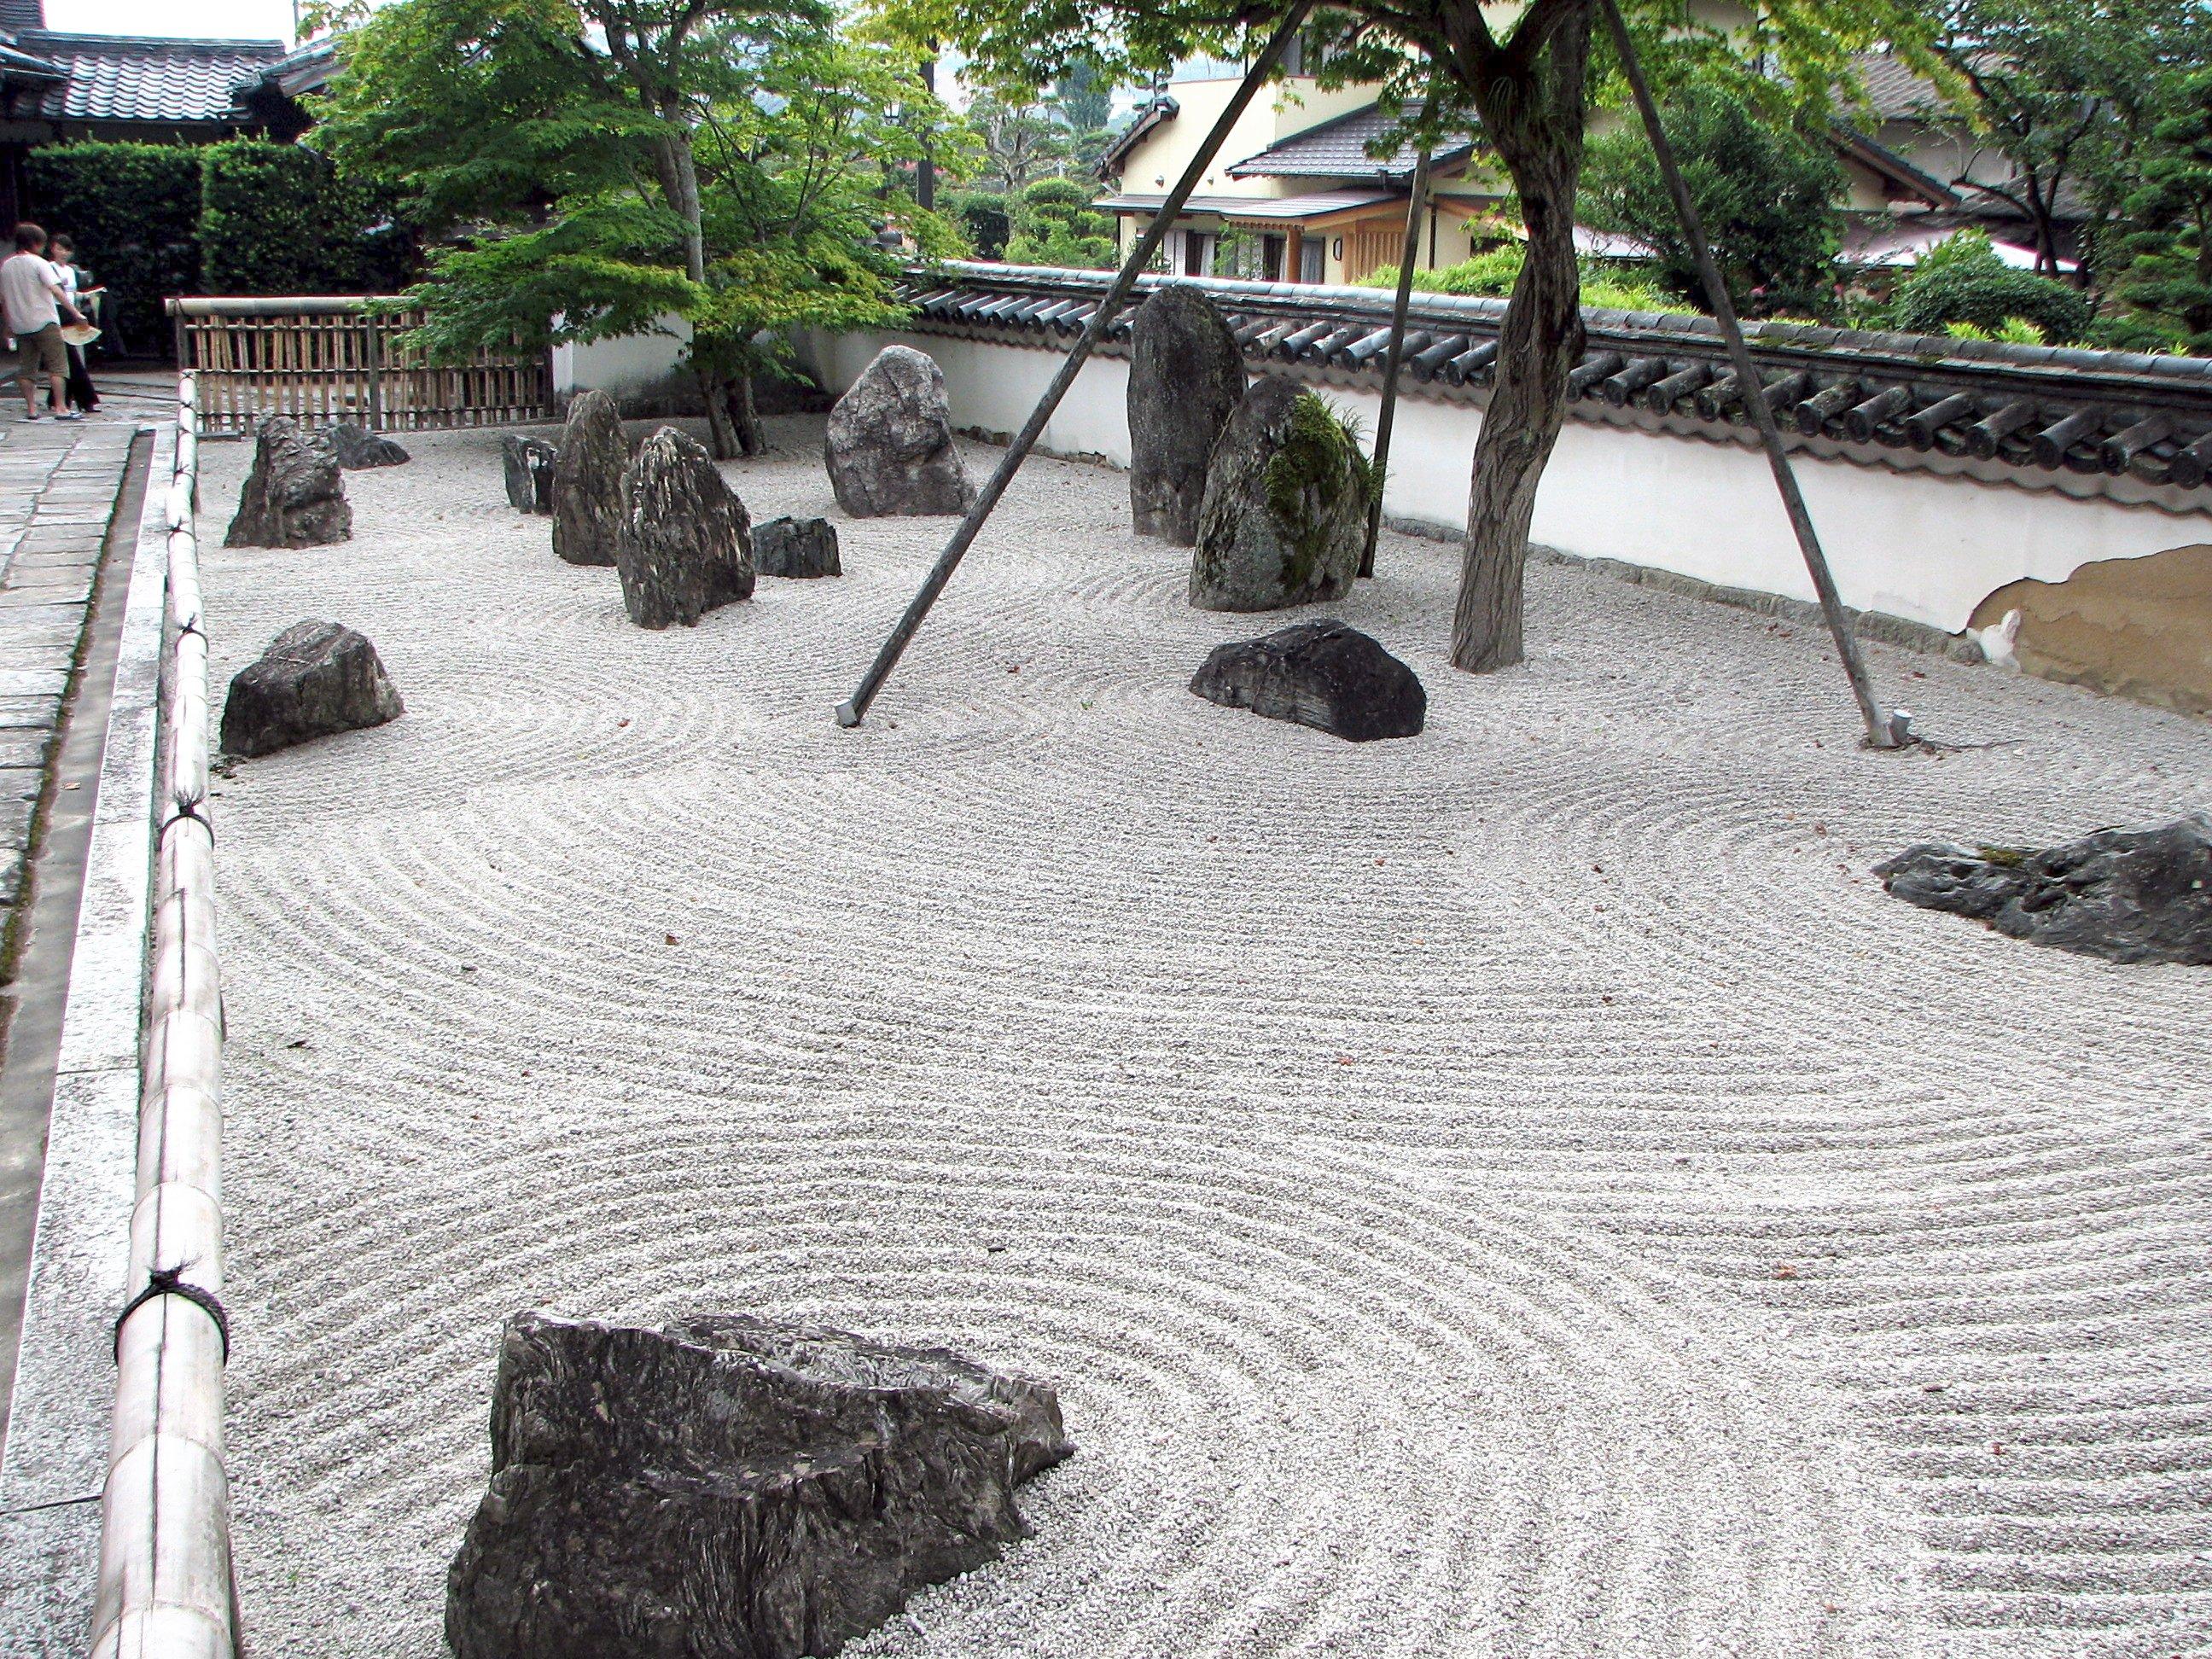 Filekomyozenji stone garden 1g wikimedia commons filekomyozenji stone garden 1g workwithnaturefo